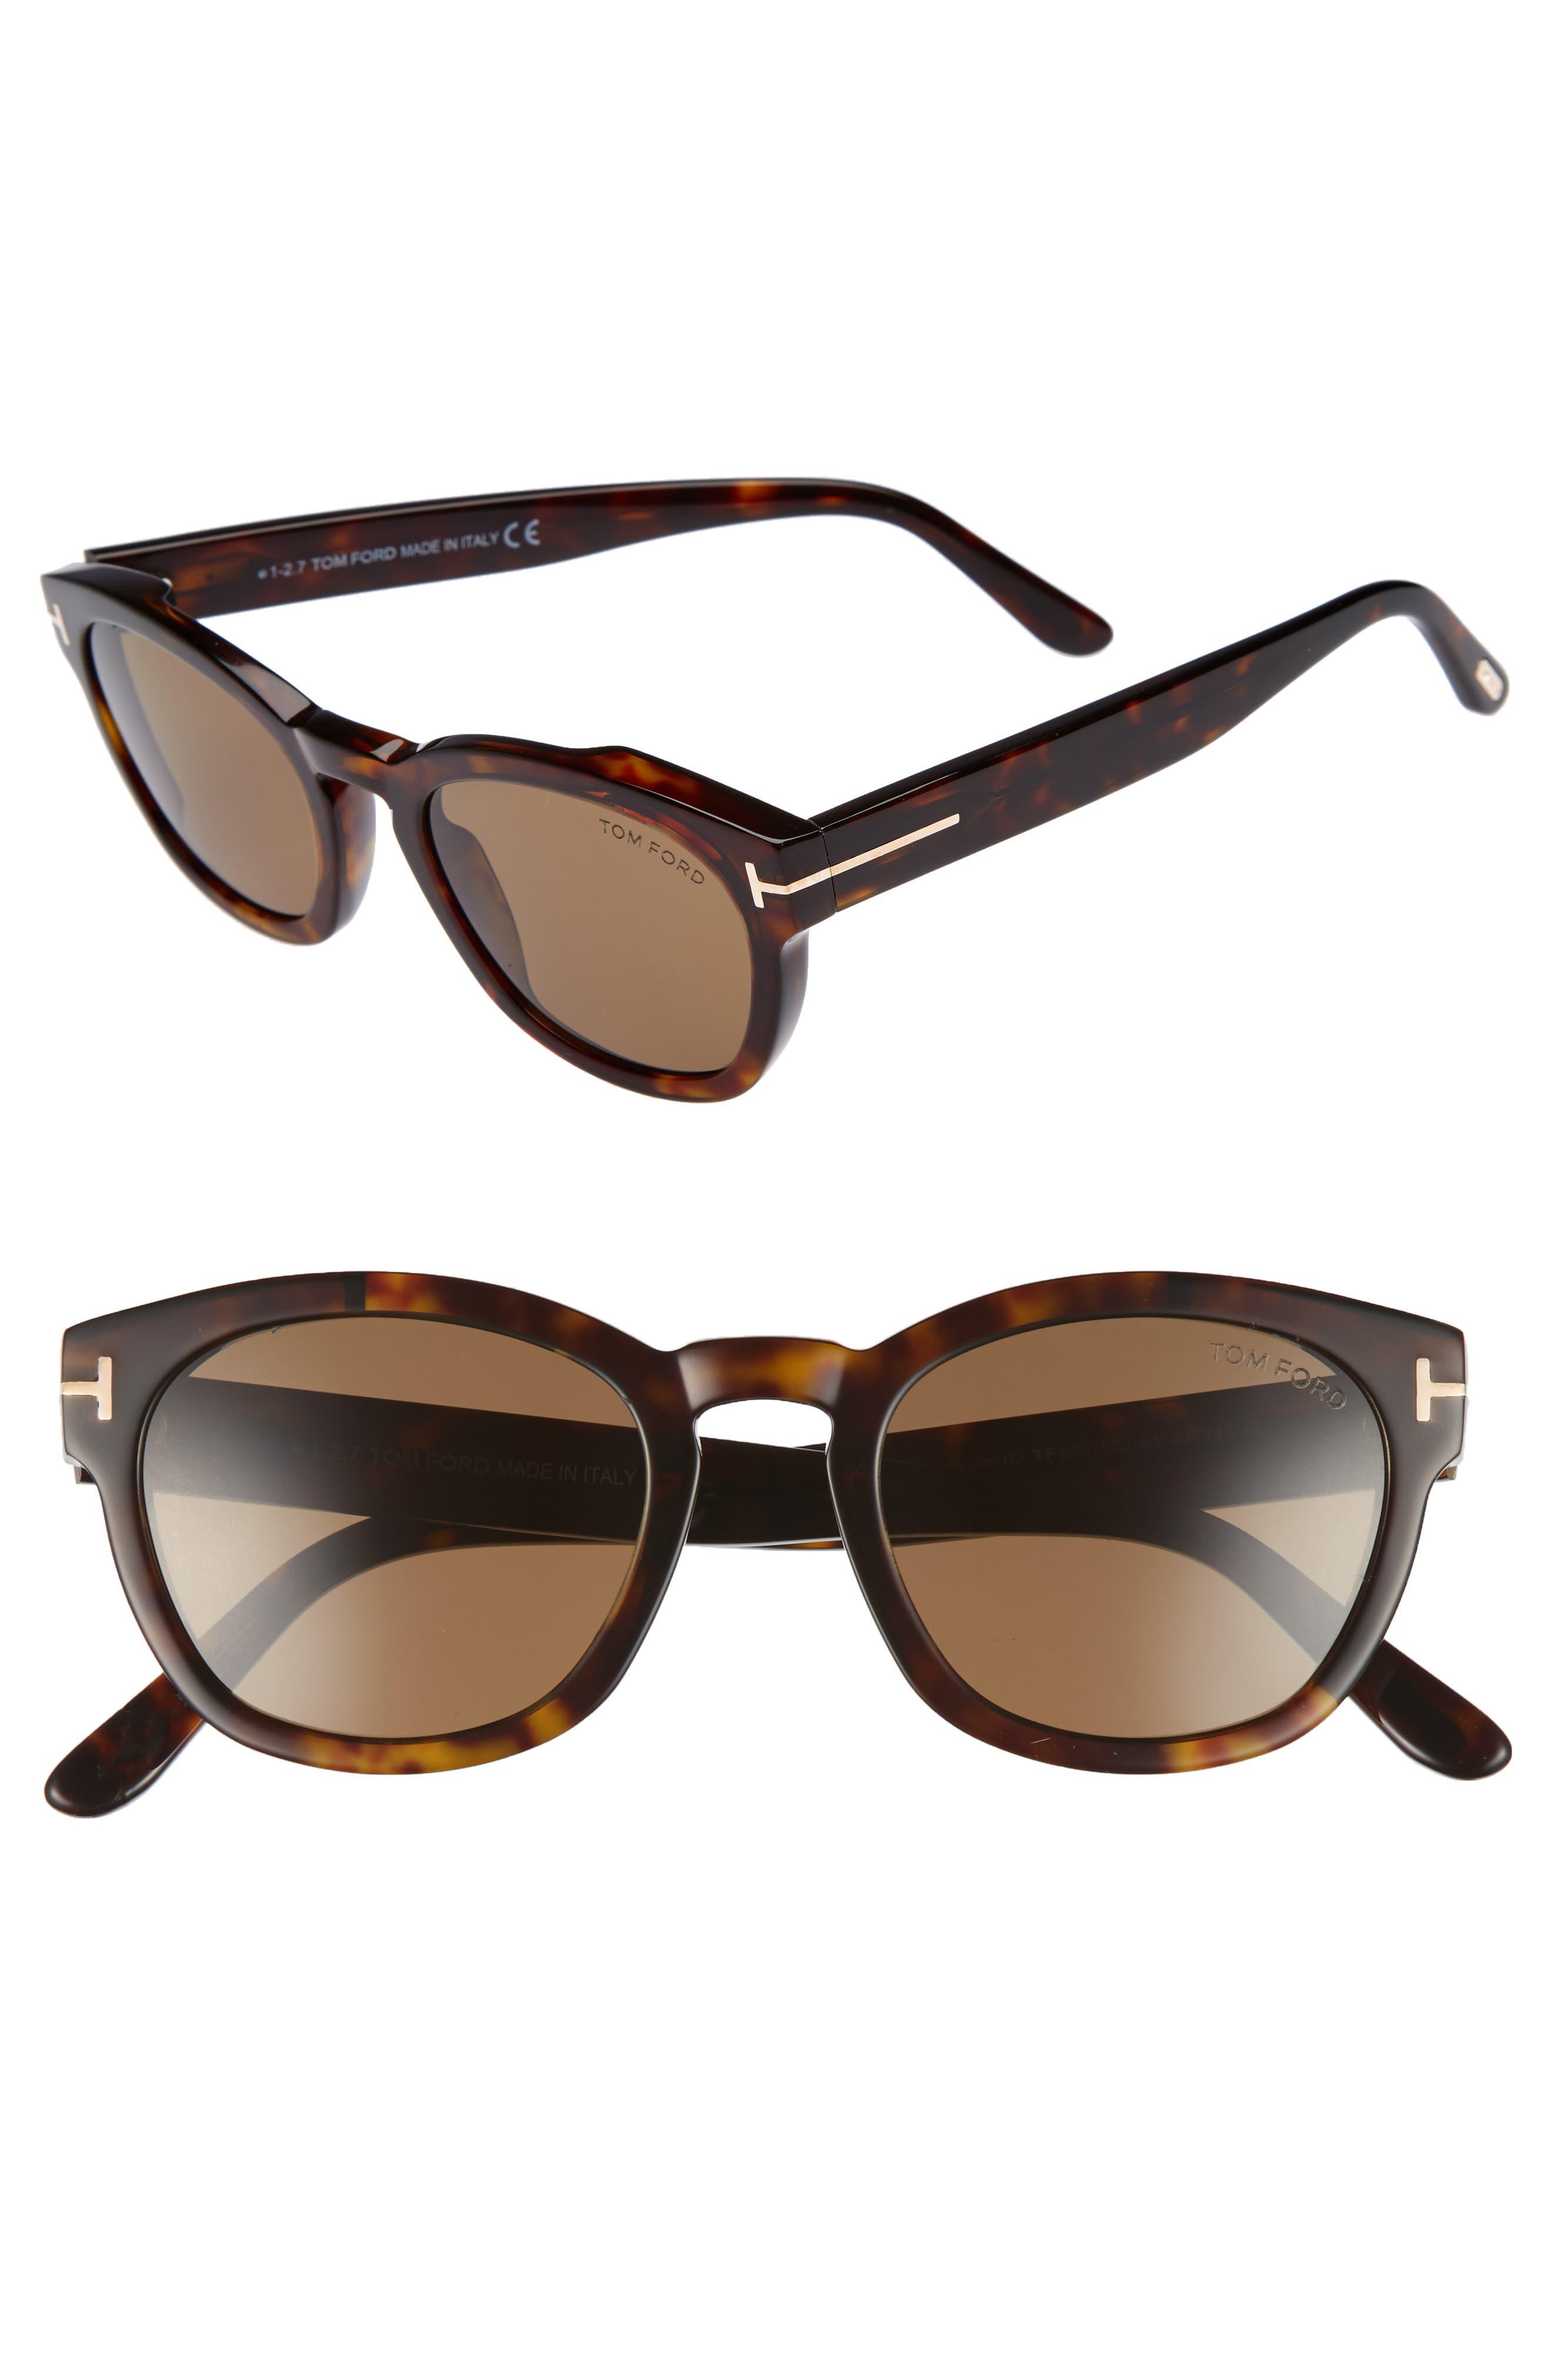 Main Image - Tom Ford Bryan 51mm Sunglasses